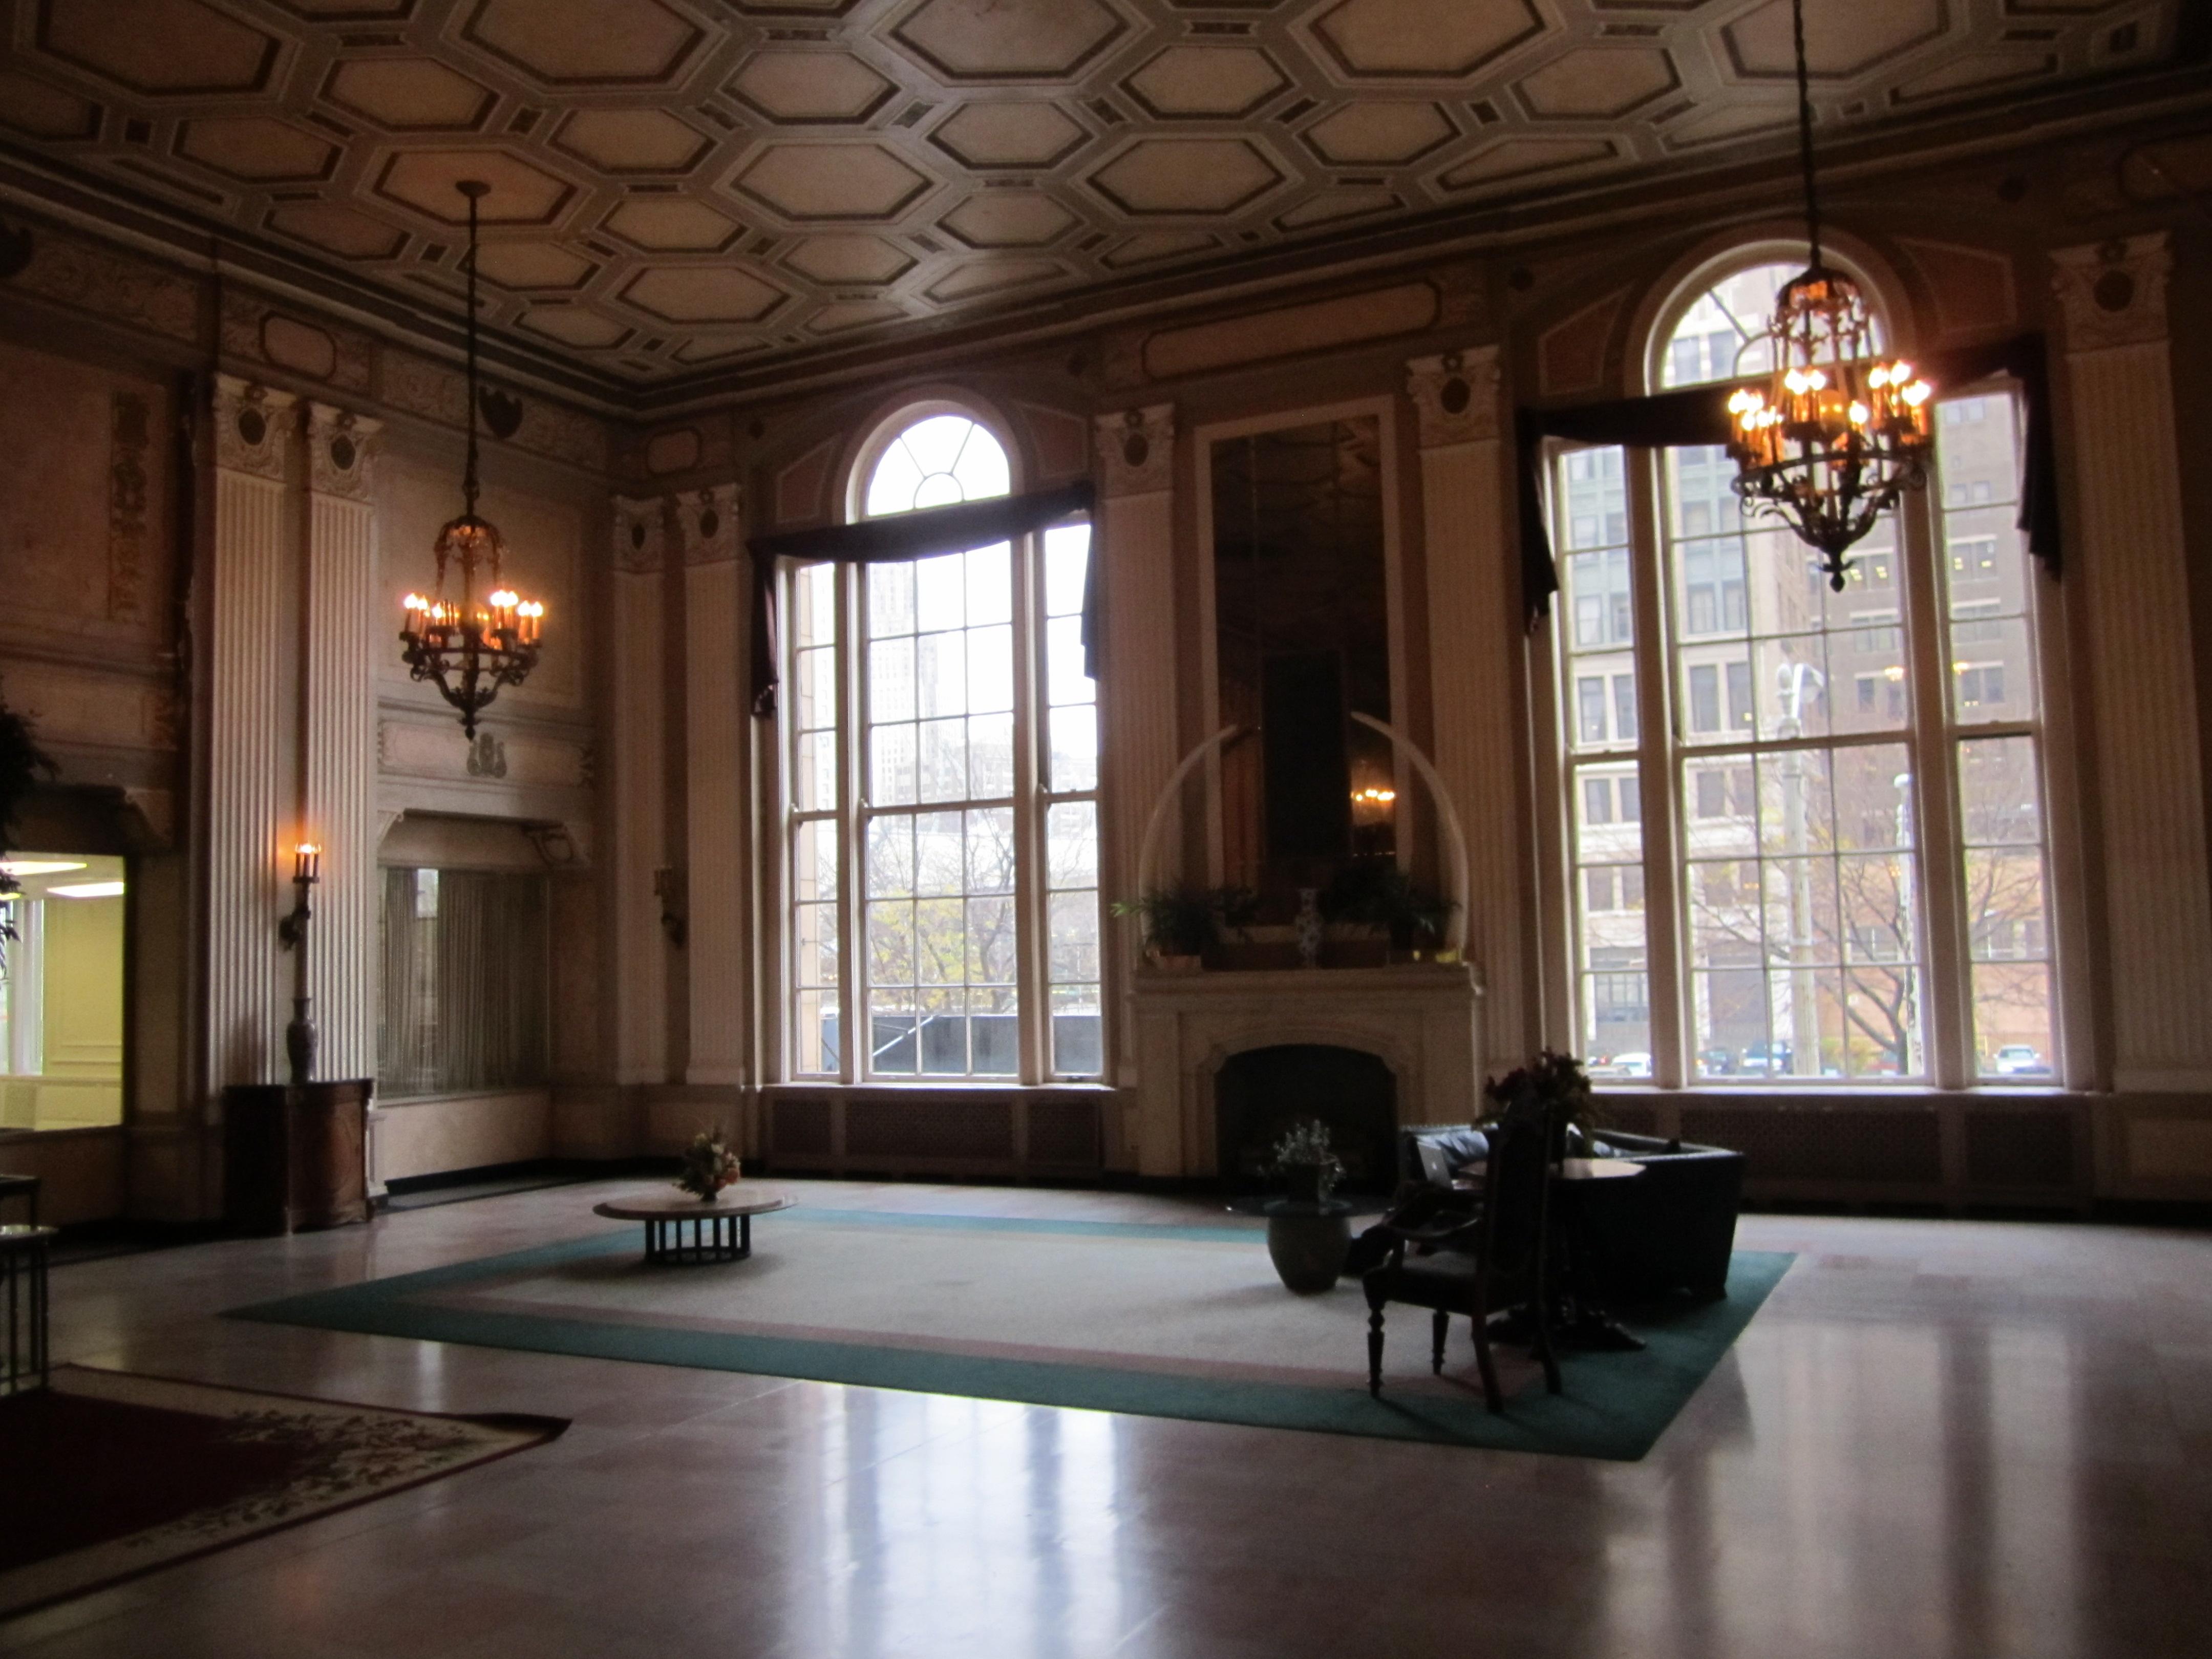 The Leland Lobby